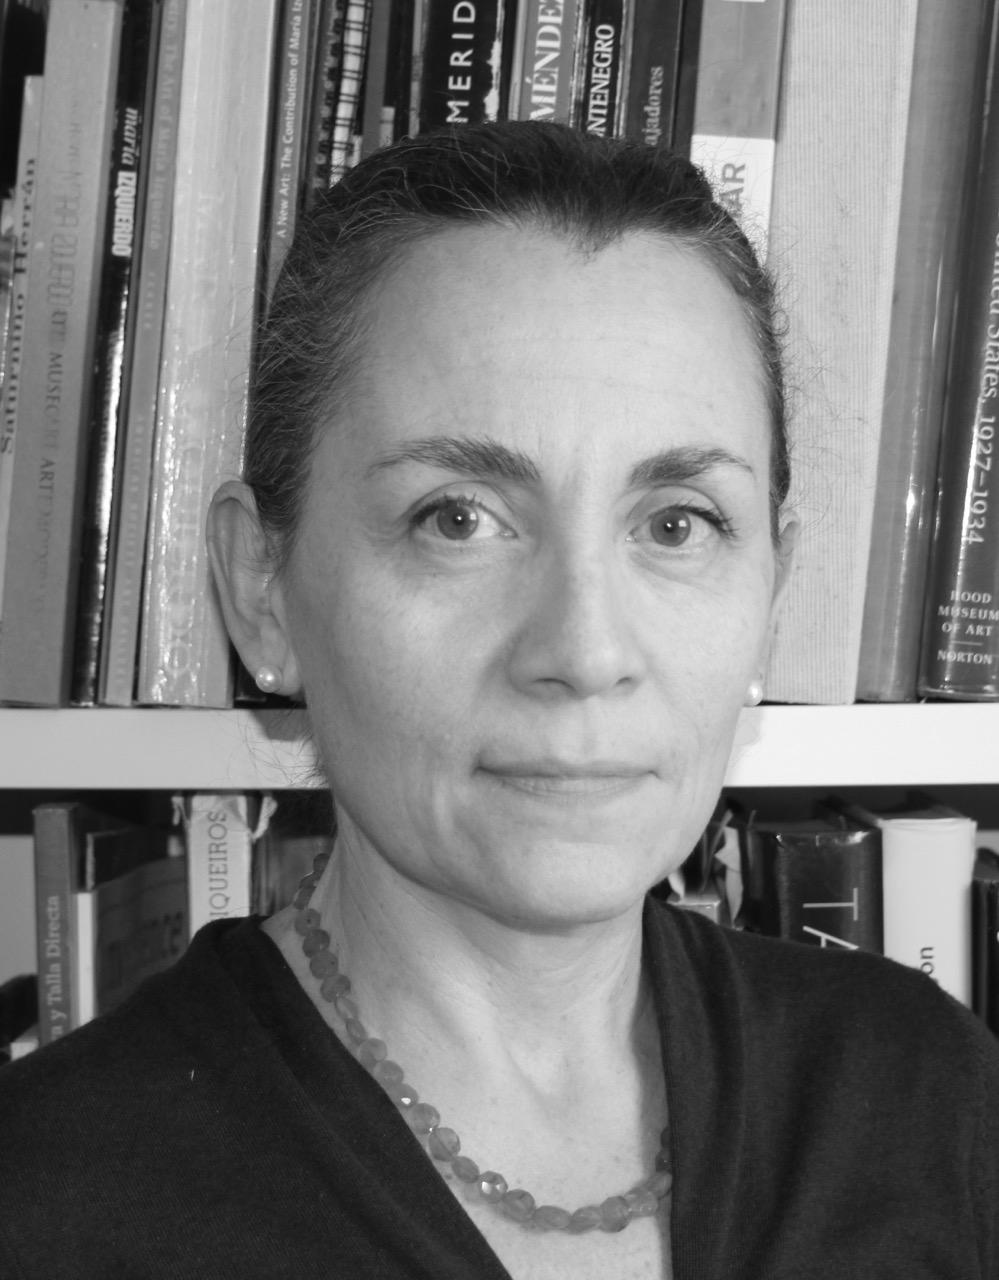 Dr. Adriana Zavala, associate professor of art history, and director of the Latino Studies program at Tufts University (photo courtesy of Dr. Zavala)